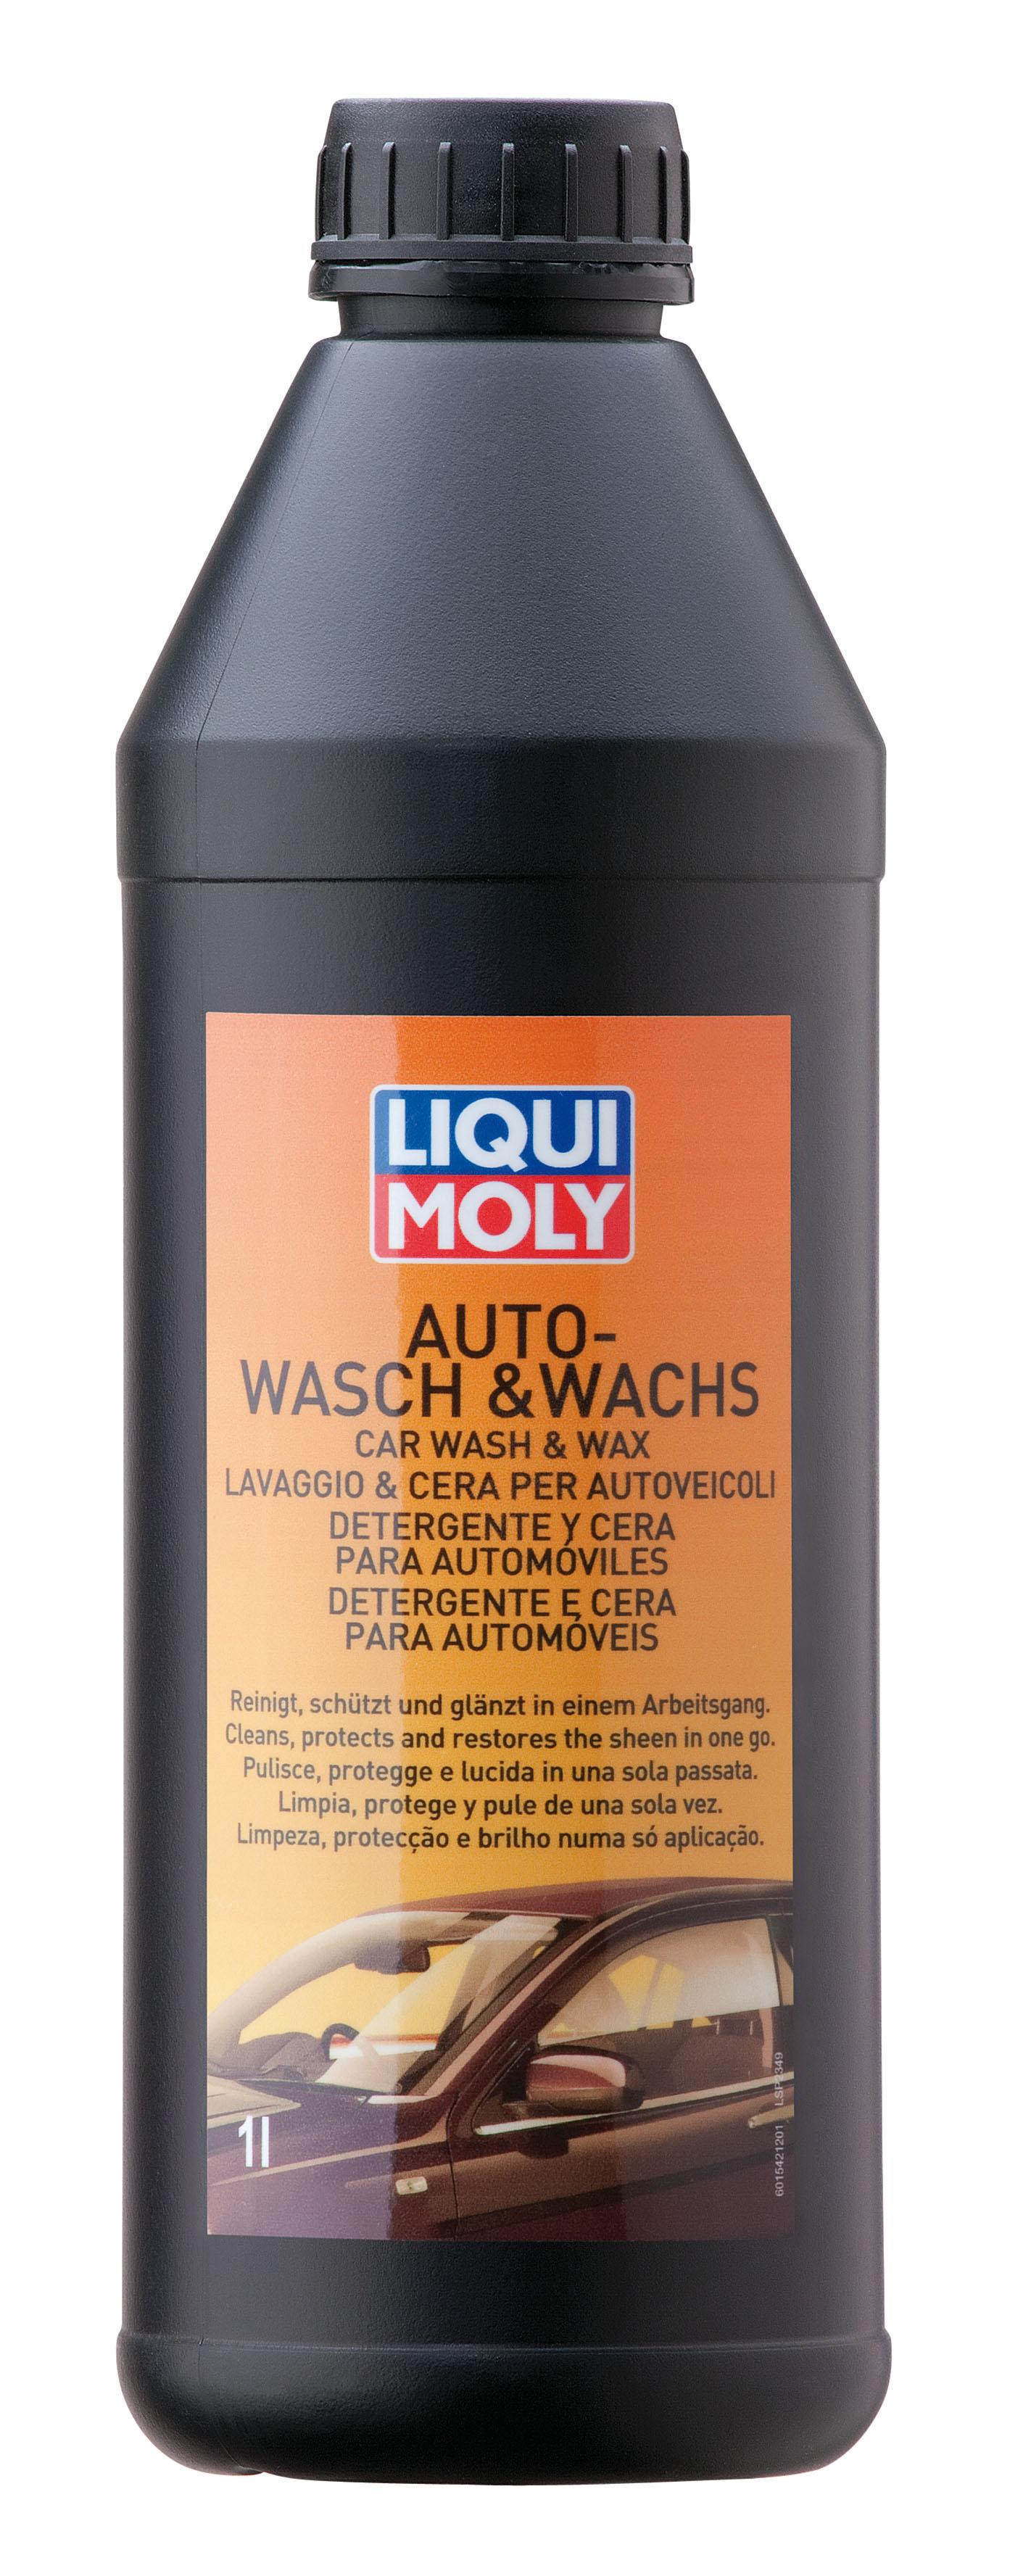 liqui moly 1542 auto wasch wachs pflege reinigung 1l ebay. Black Bedroom Furniture Sets. Home Design Ideas